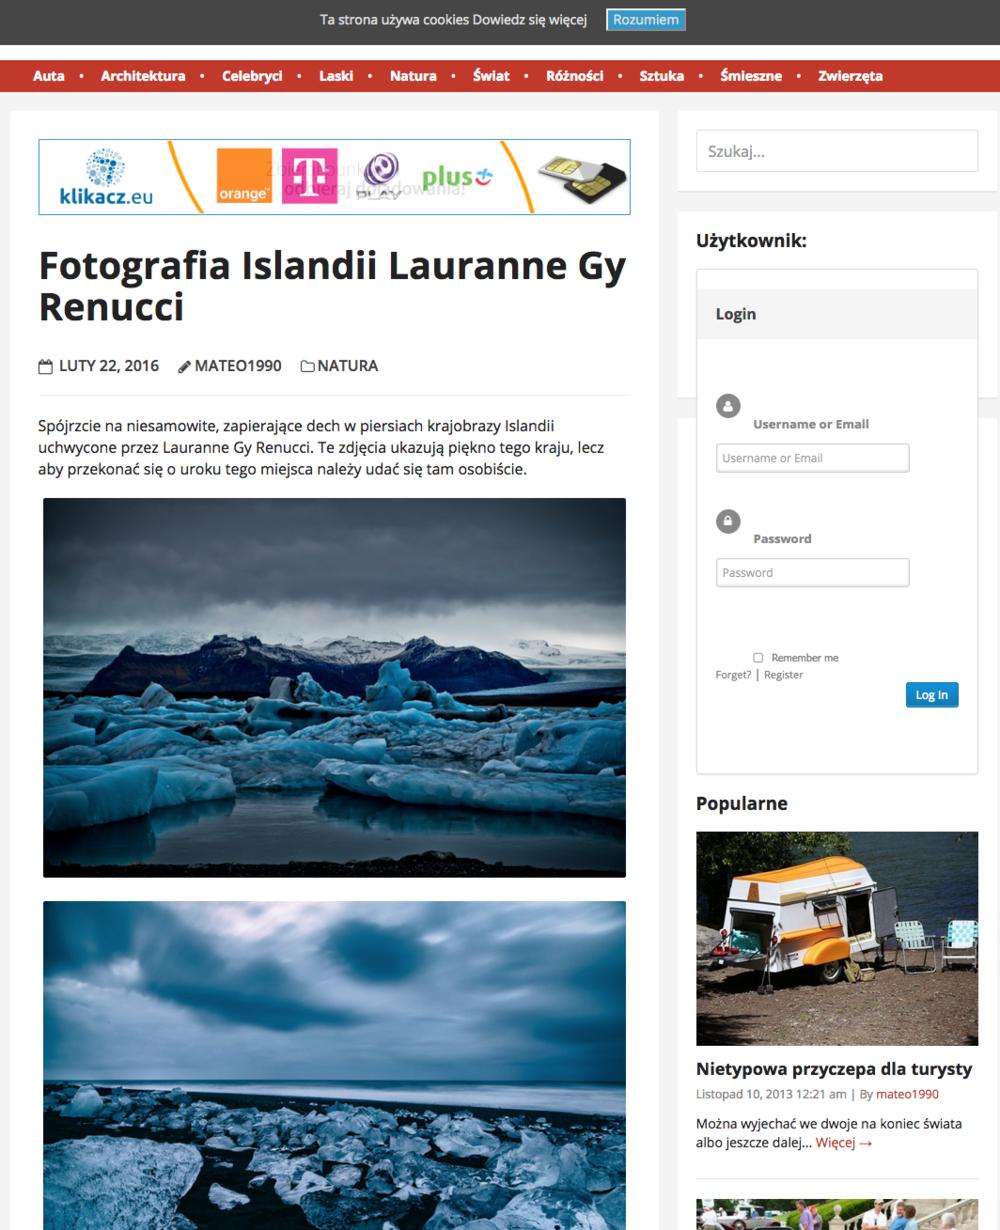 Fotografia Islandii Lauranne Gy Renucci